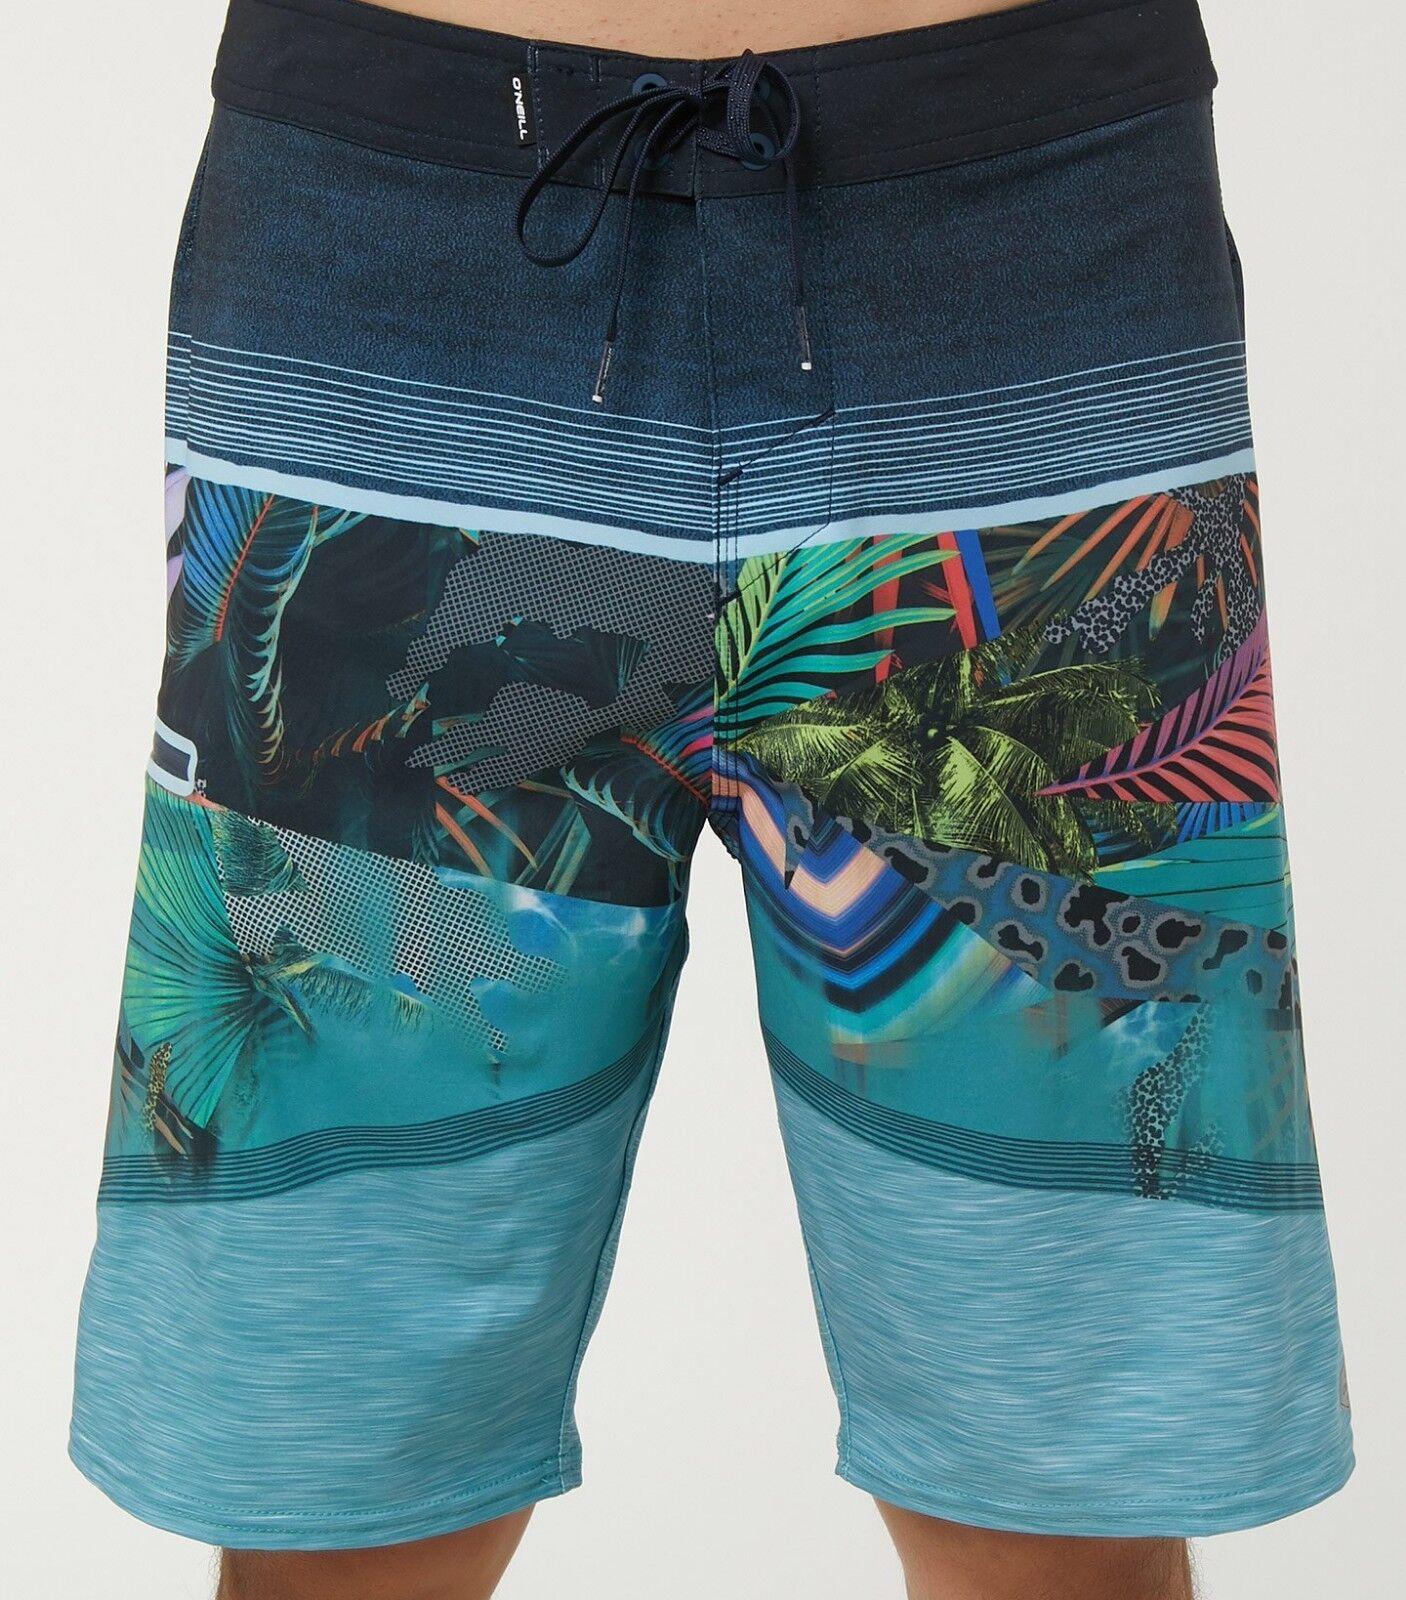 O'Neill Hyperfreak Boardshort (32) Dark bluee 1